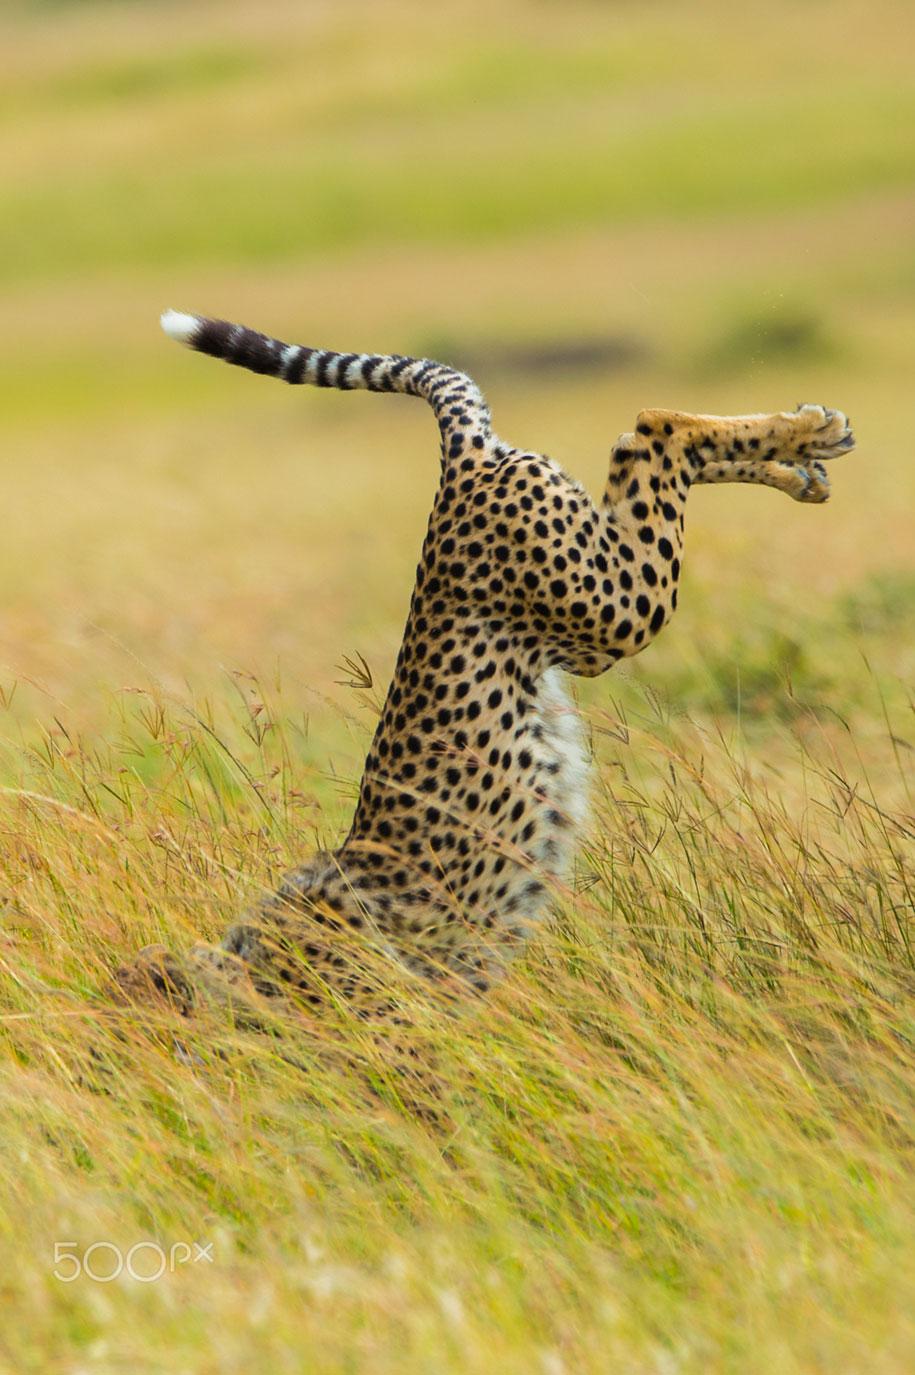 funny-animal-pictures-comedy-wildlife-photography-awards-paul-joynson-hicks-1